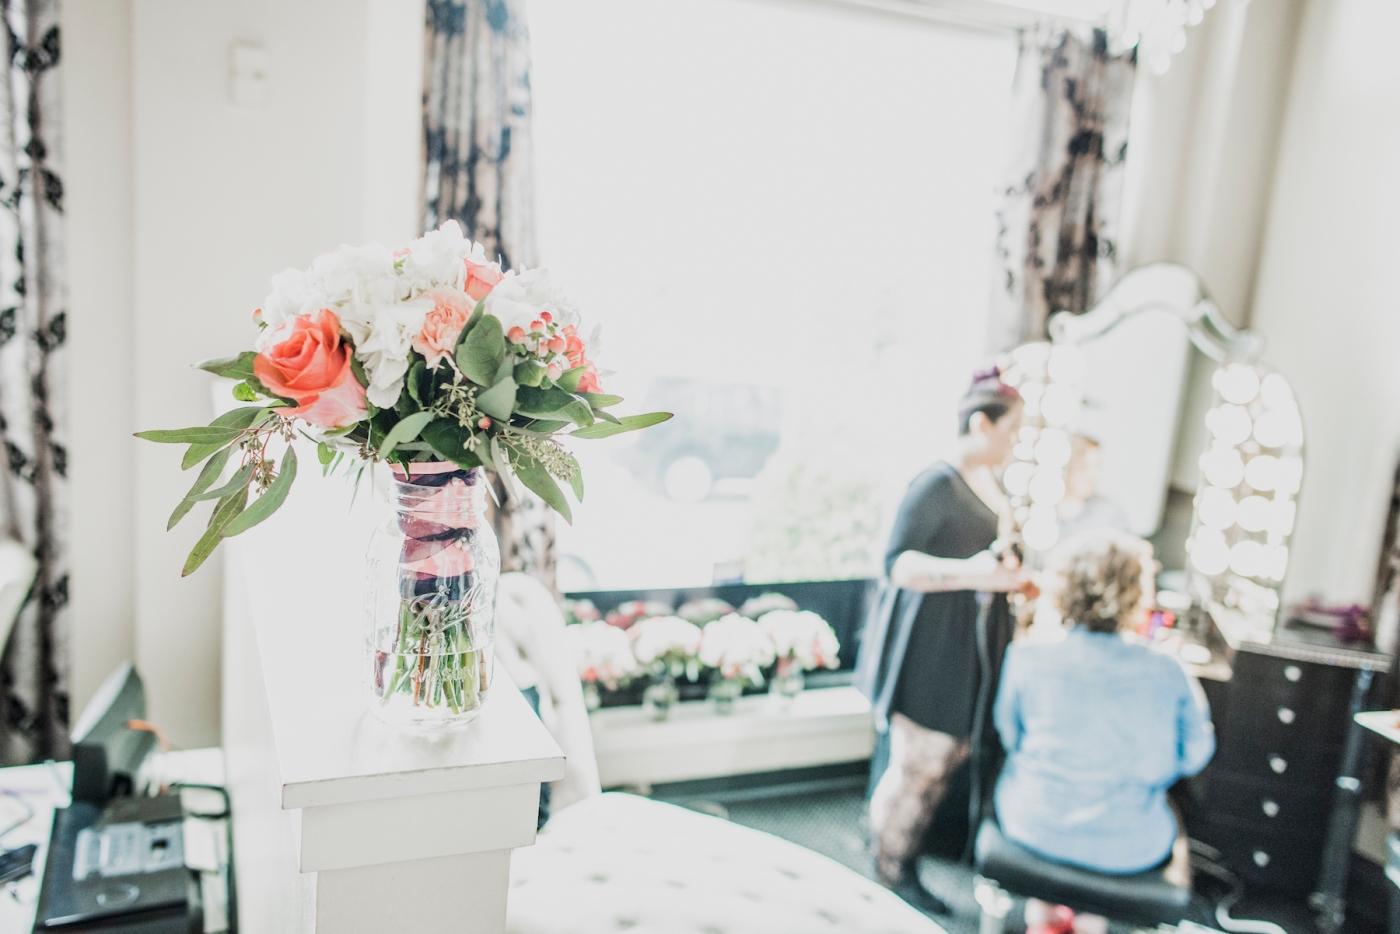 DSC_1794Everett_Wedding_Ballroom_Jane_Speleers_photography_Rachel_and_Edmund_Getting_ready_2017